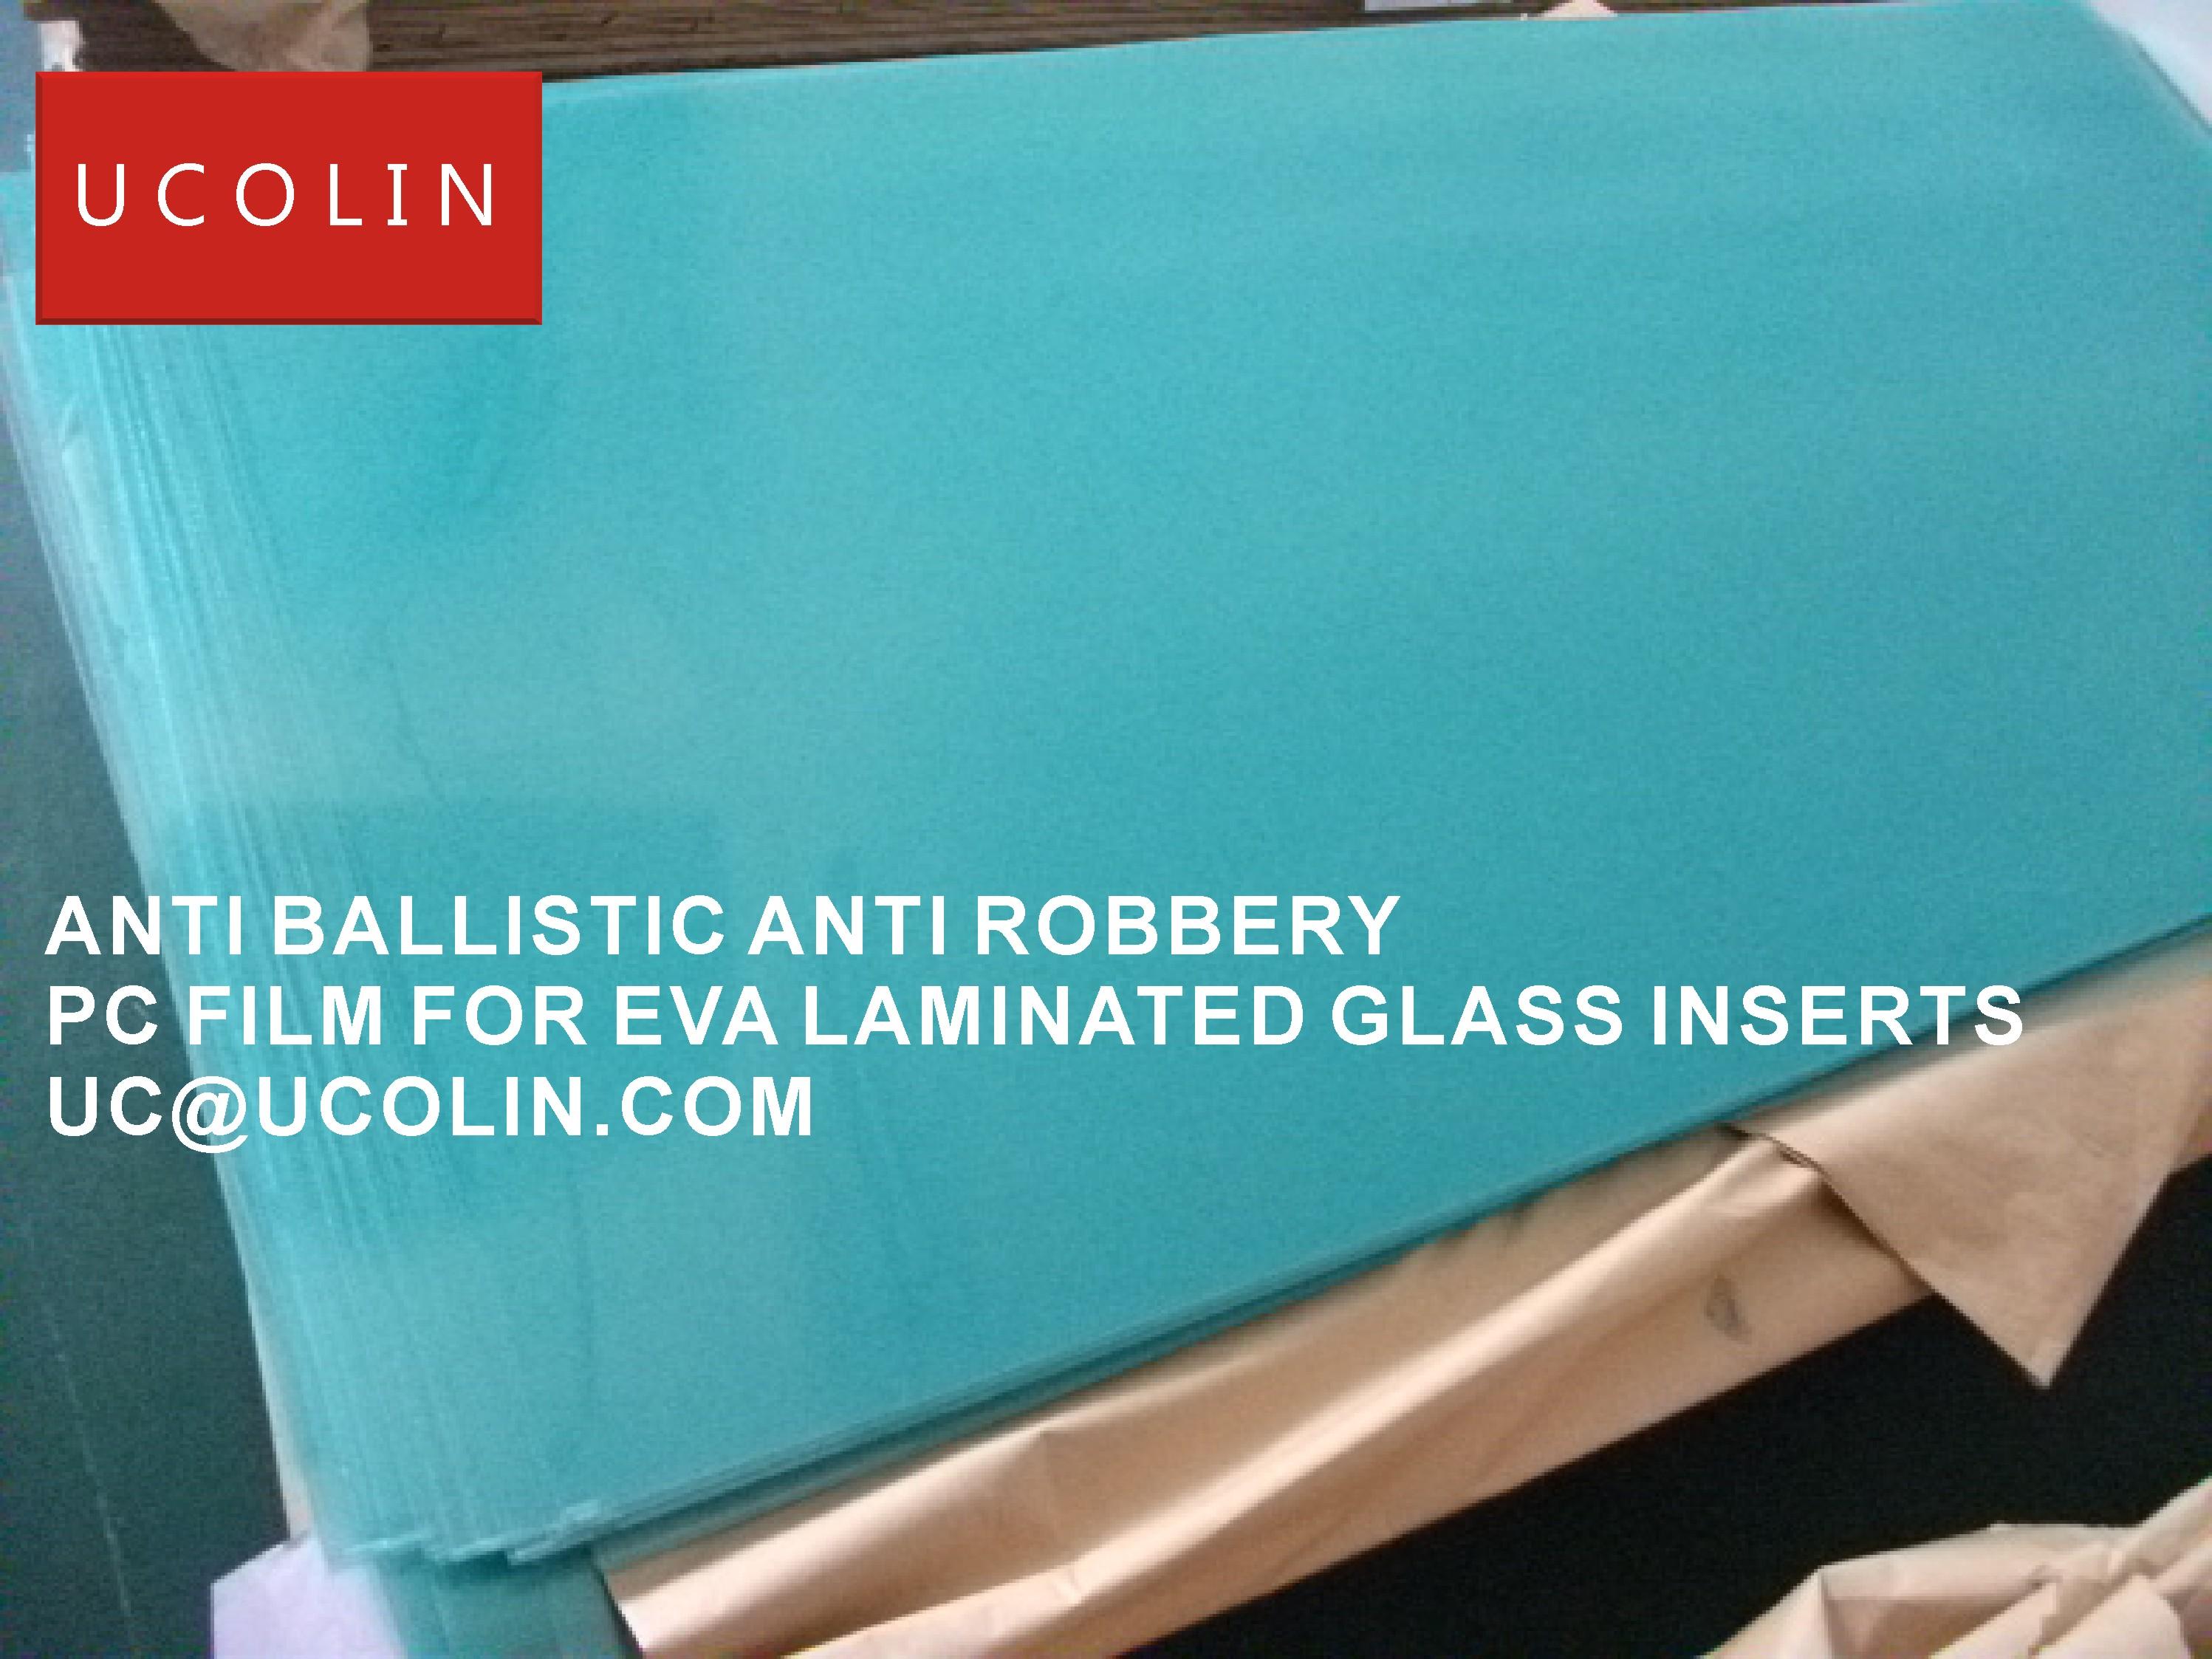 01 ANTI BALLISTIC ANTI ROBBERY PC FILM FOR EVA LAMINATED GLASS INSERTS